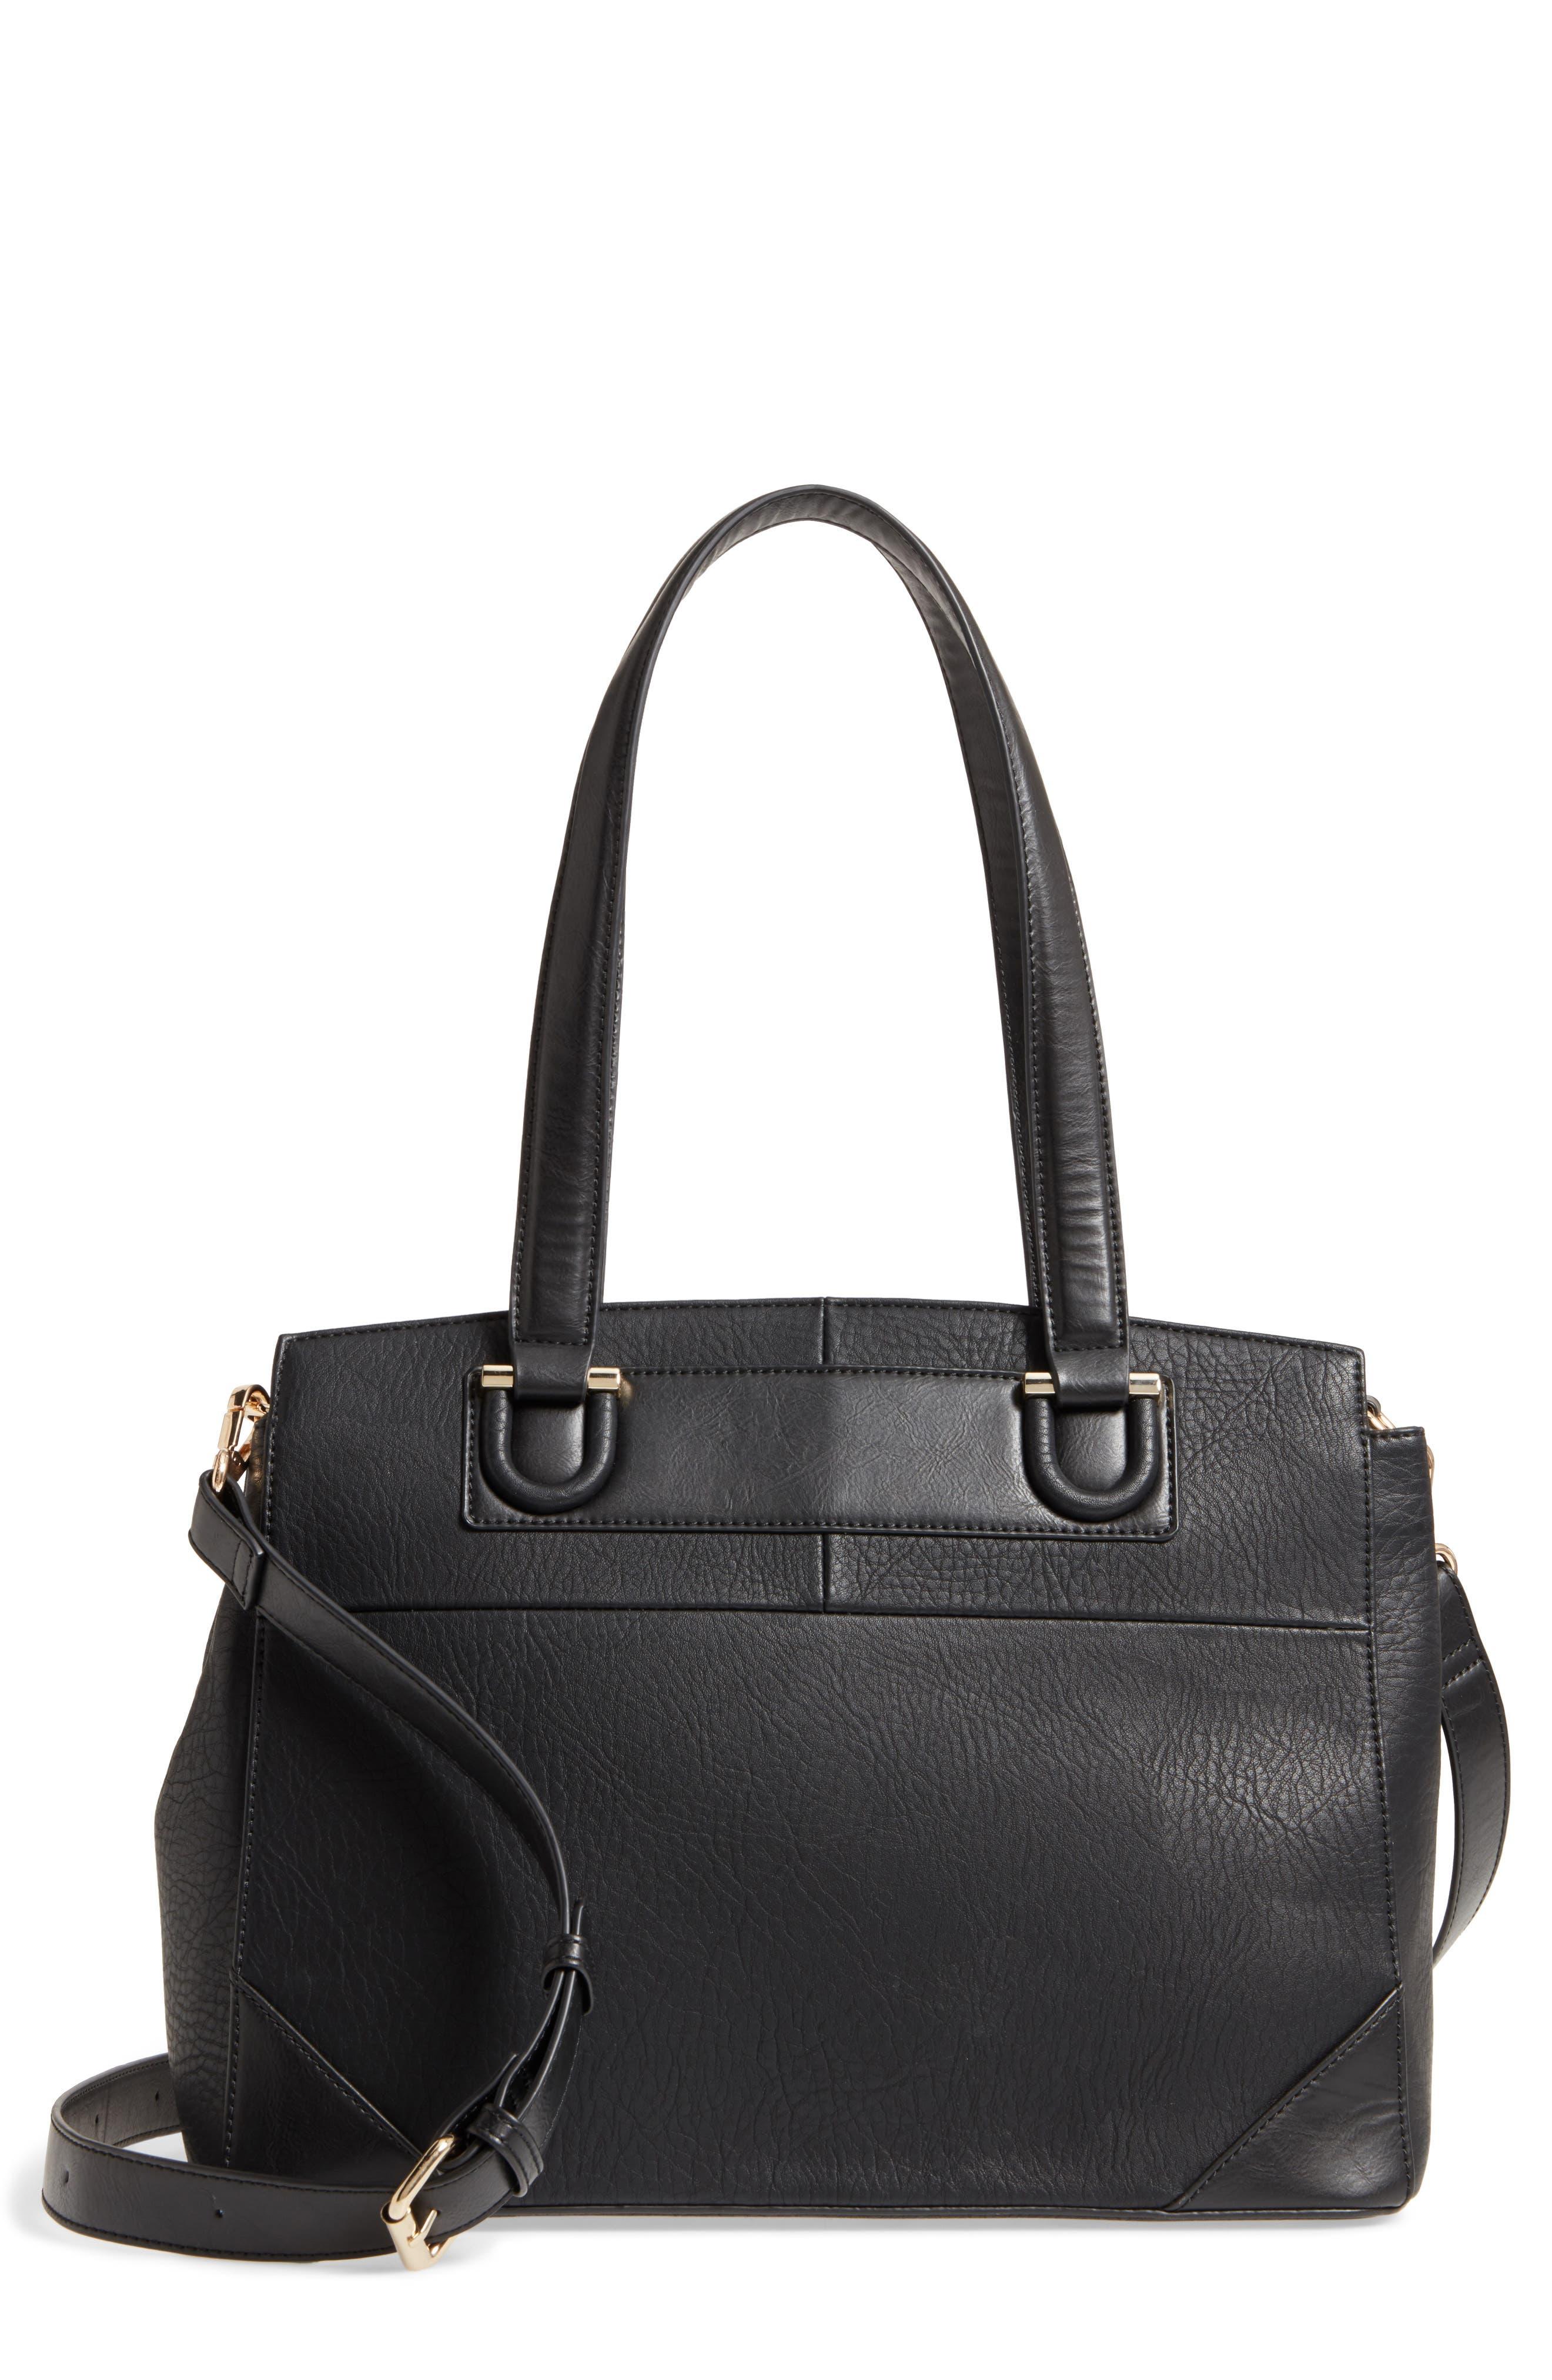 Sterling Faux Leather Satchel,                         Main,                         color, BLACK